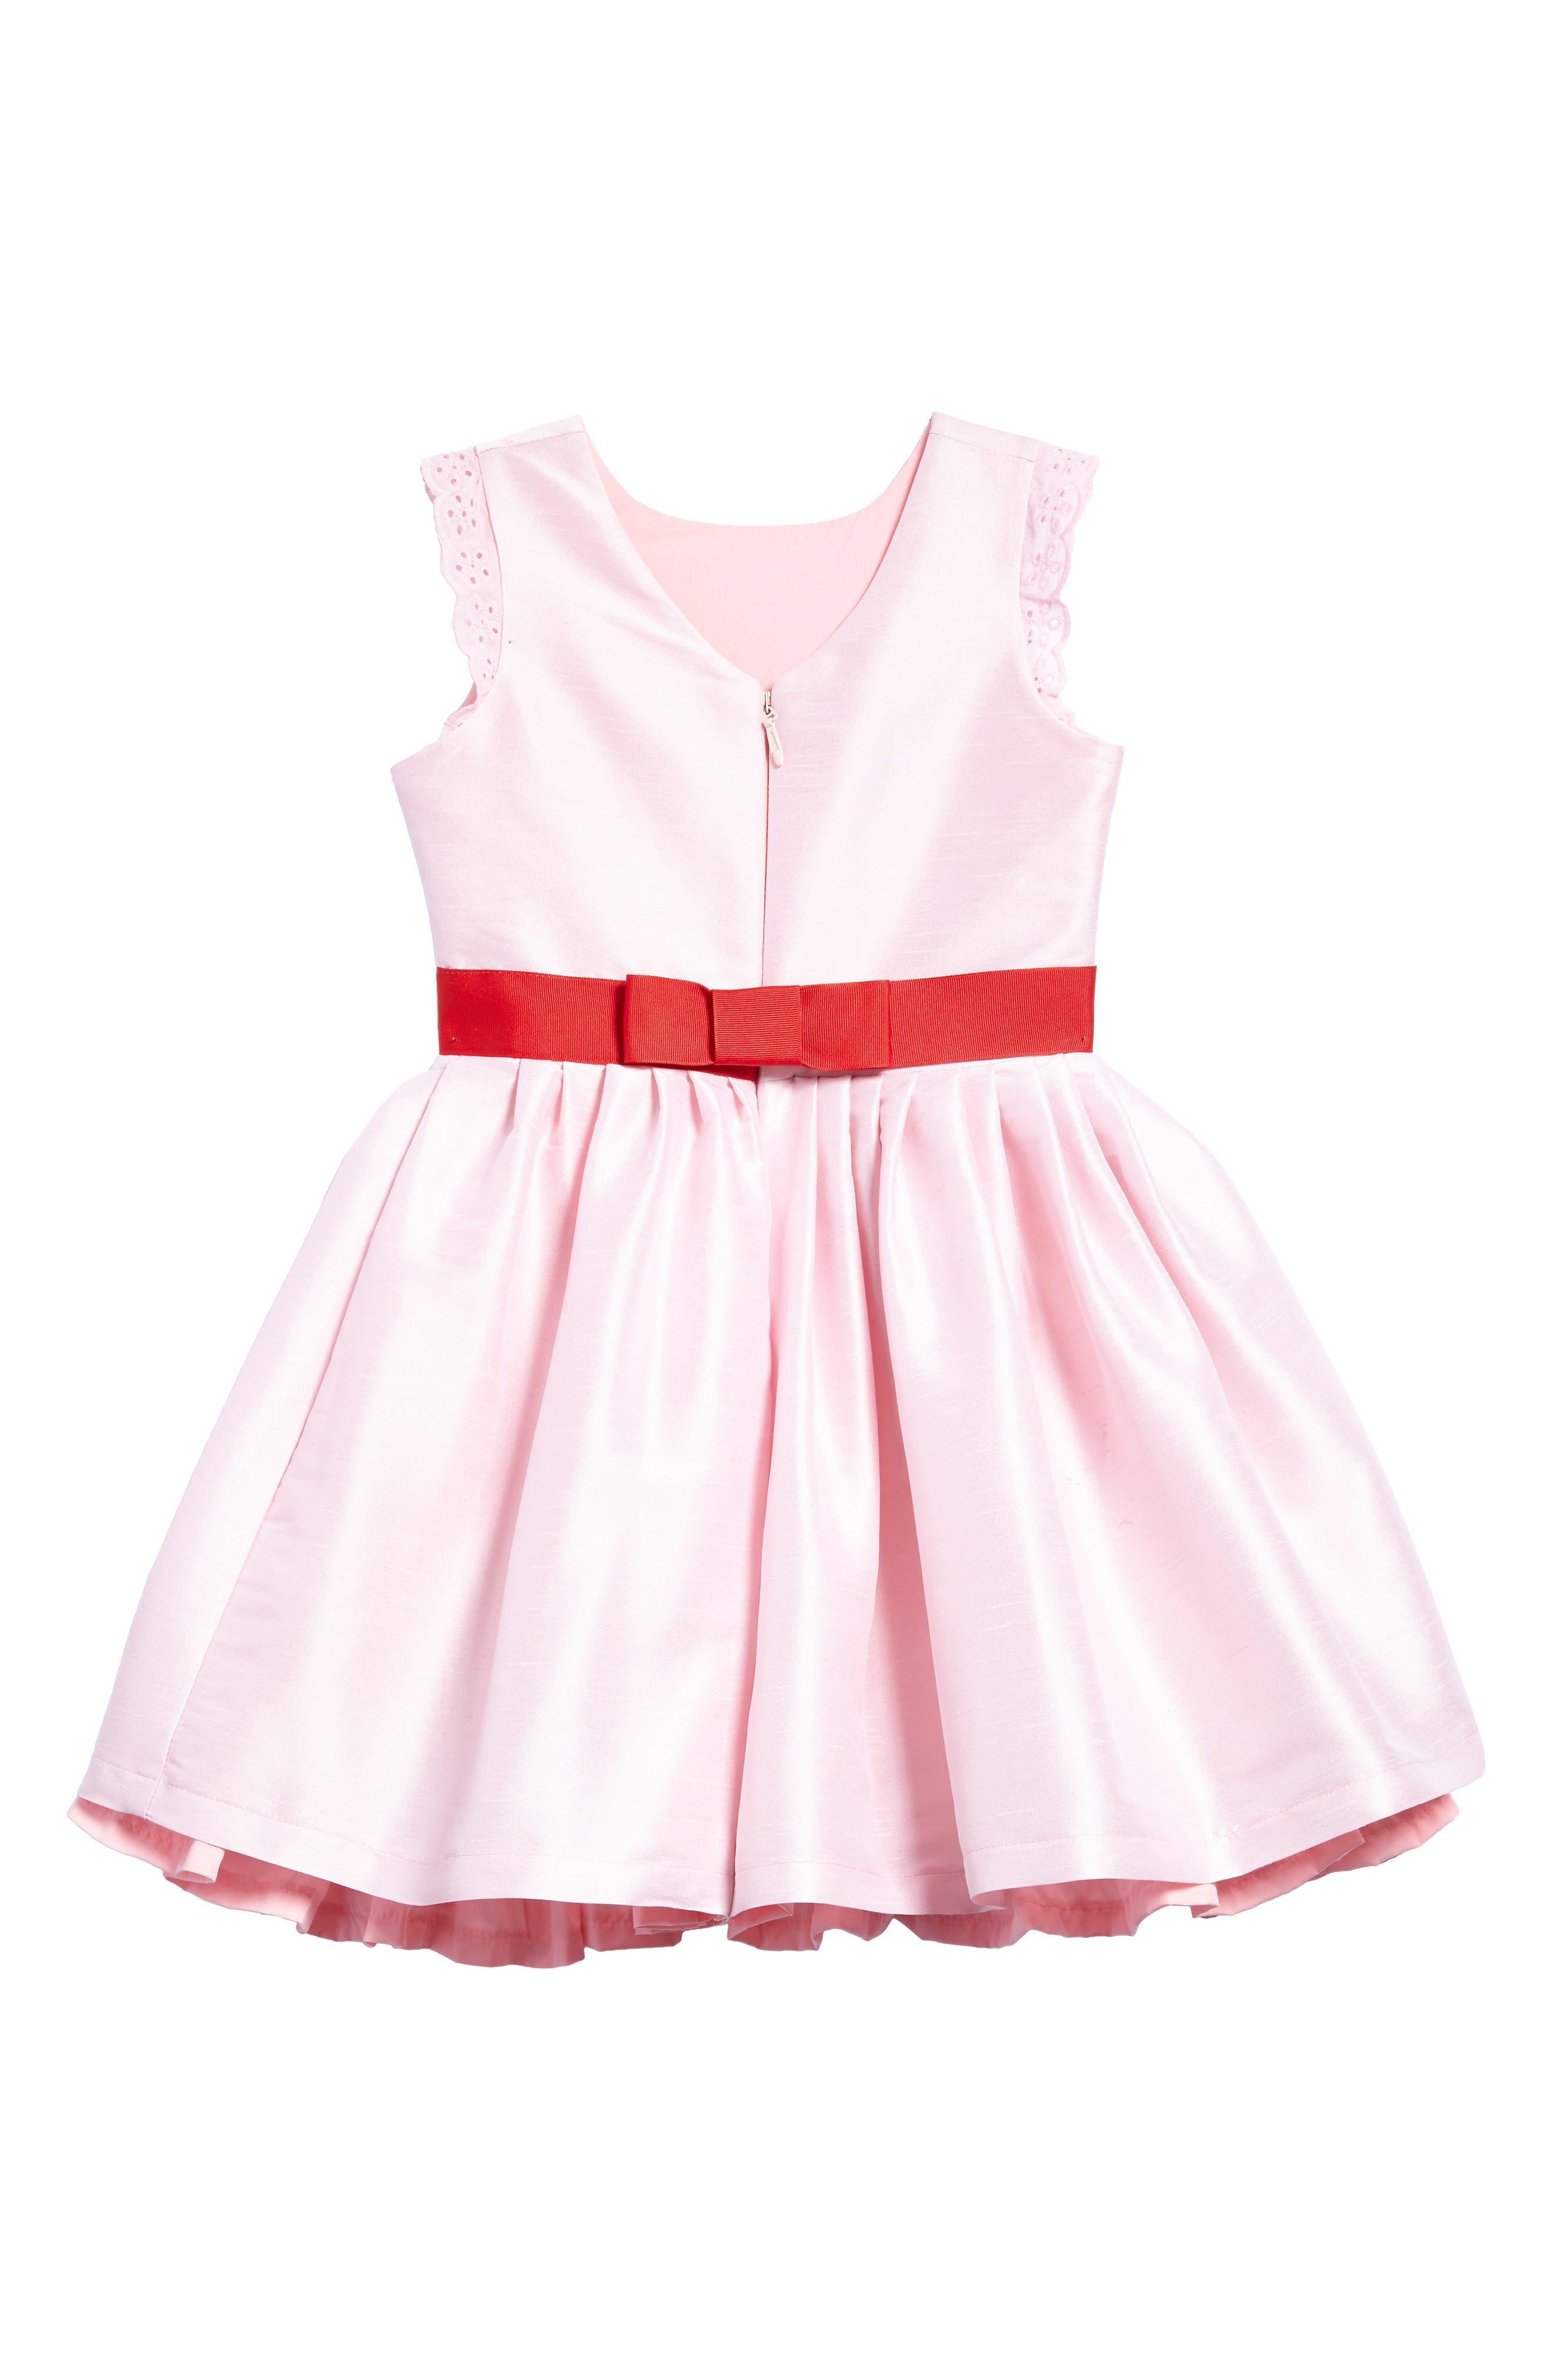 Kisses from Paris Party Dress,                             Alternate thumbnail 2, color,                             Pink